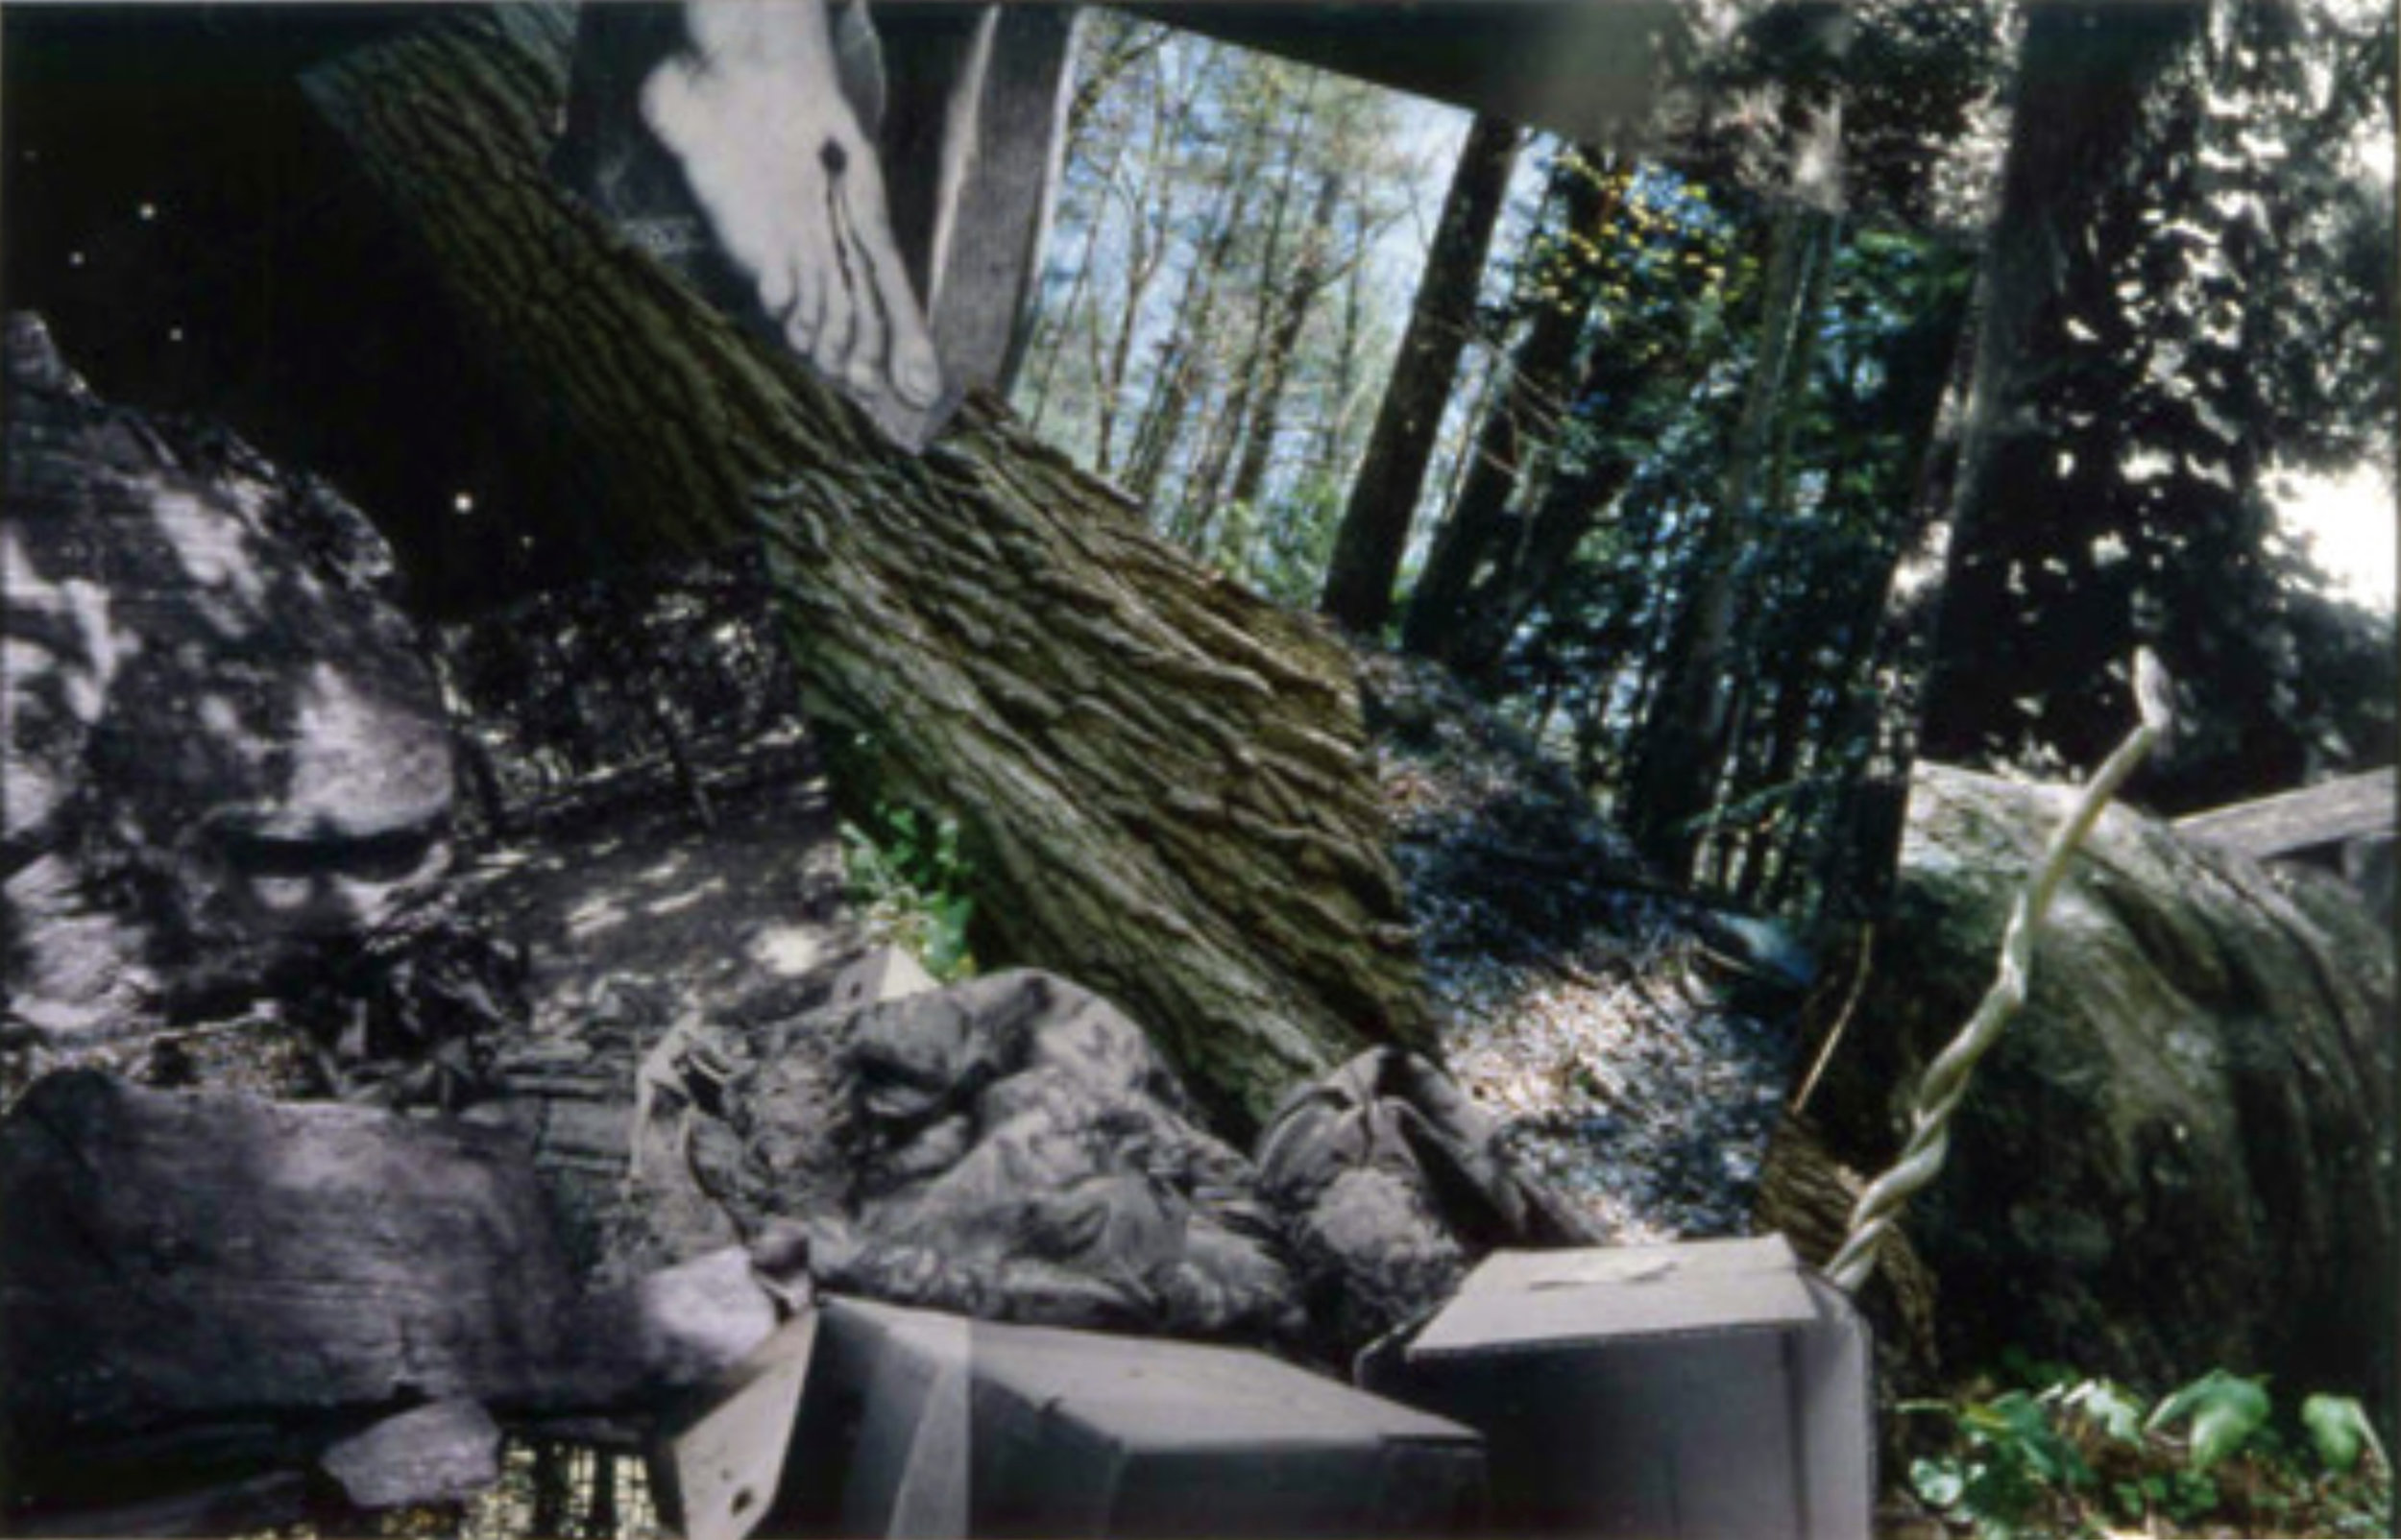 John O'Reilly  Climber , 2008 polaroid, color coupler, halftone montage 11h x 17w in